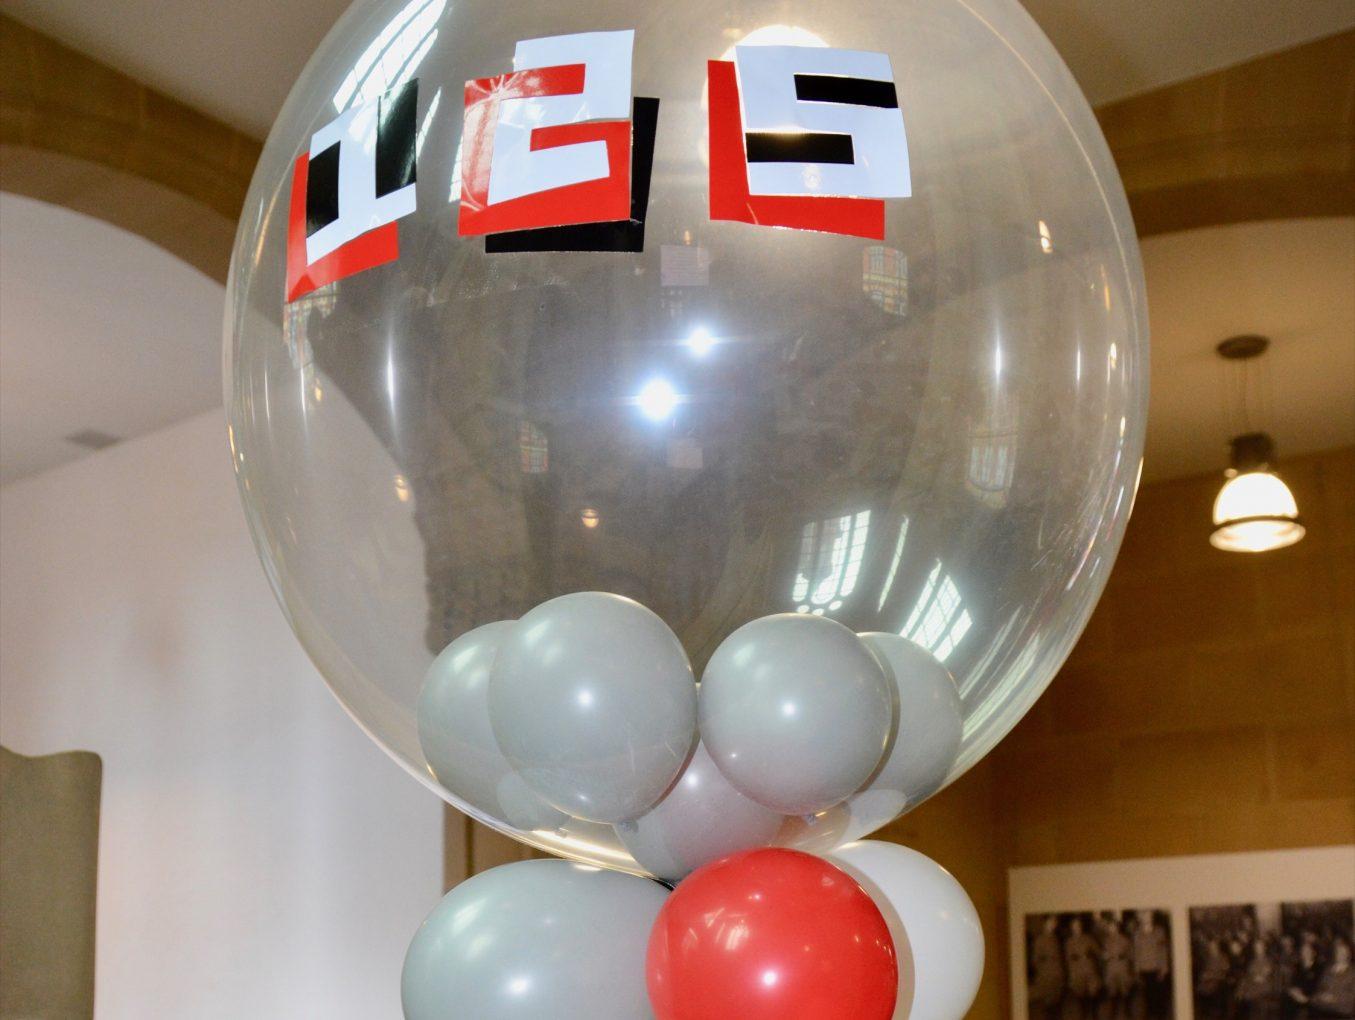 125 ans LGL - Ateliers